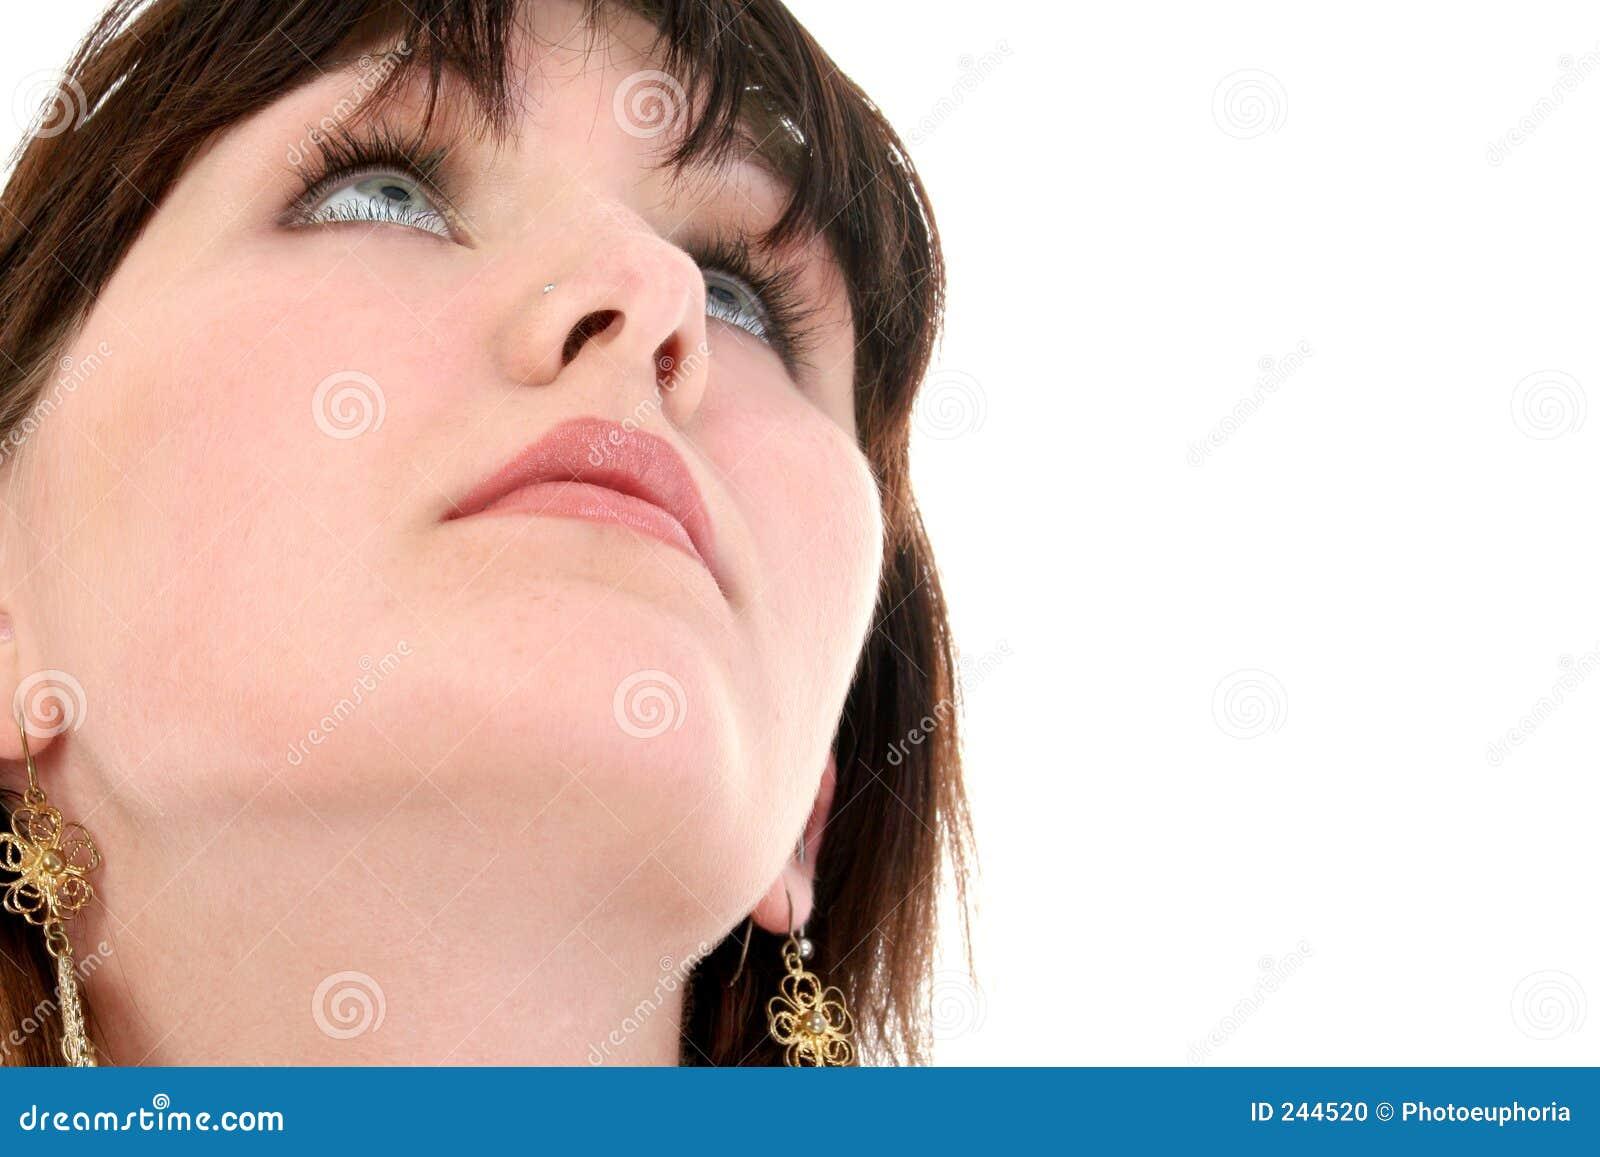 Teen Looking Up 37